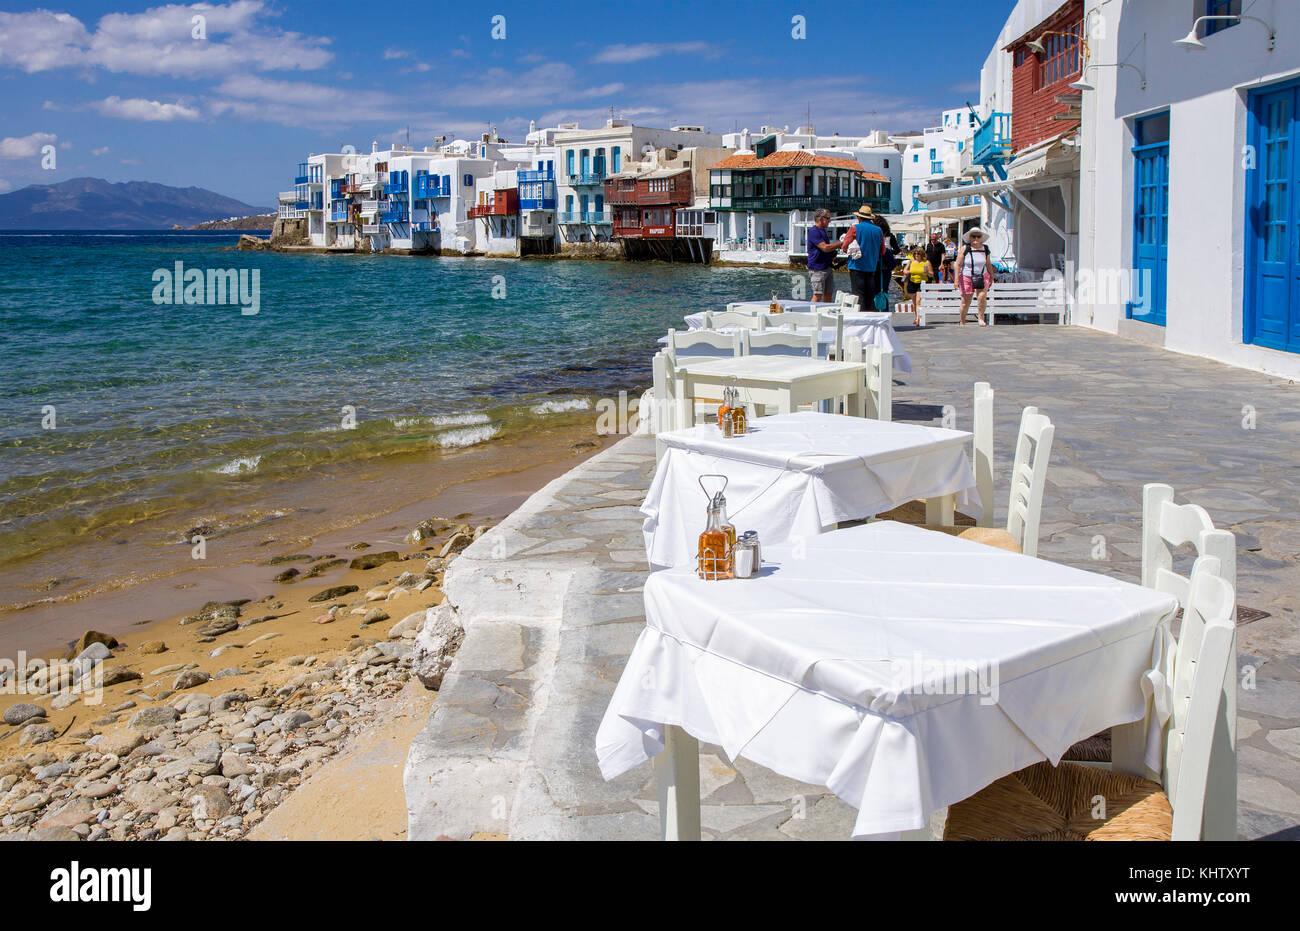 Gastronomie in Klein Venedig in Mykonos-Stadt, Gastronomie auf Klein Venedig im Mykonos-Stadt, Mykonos, Kykladen, Stockbild